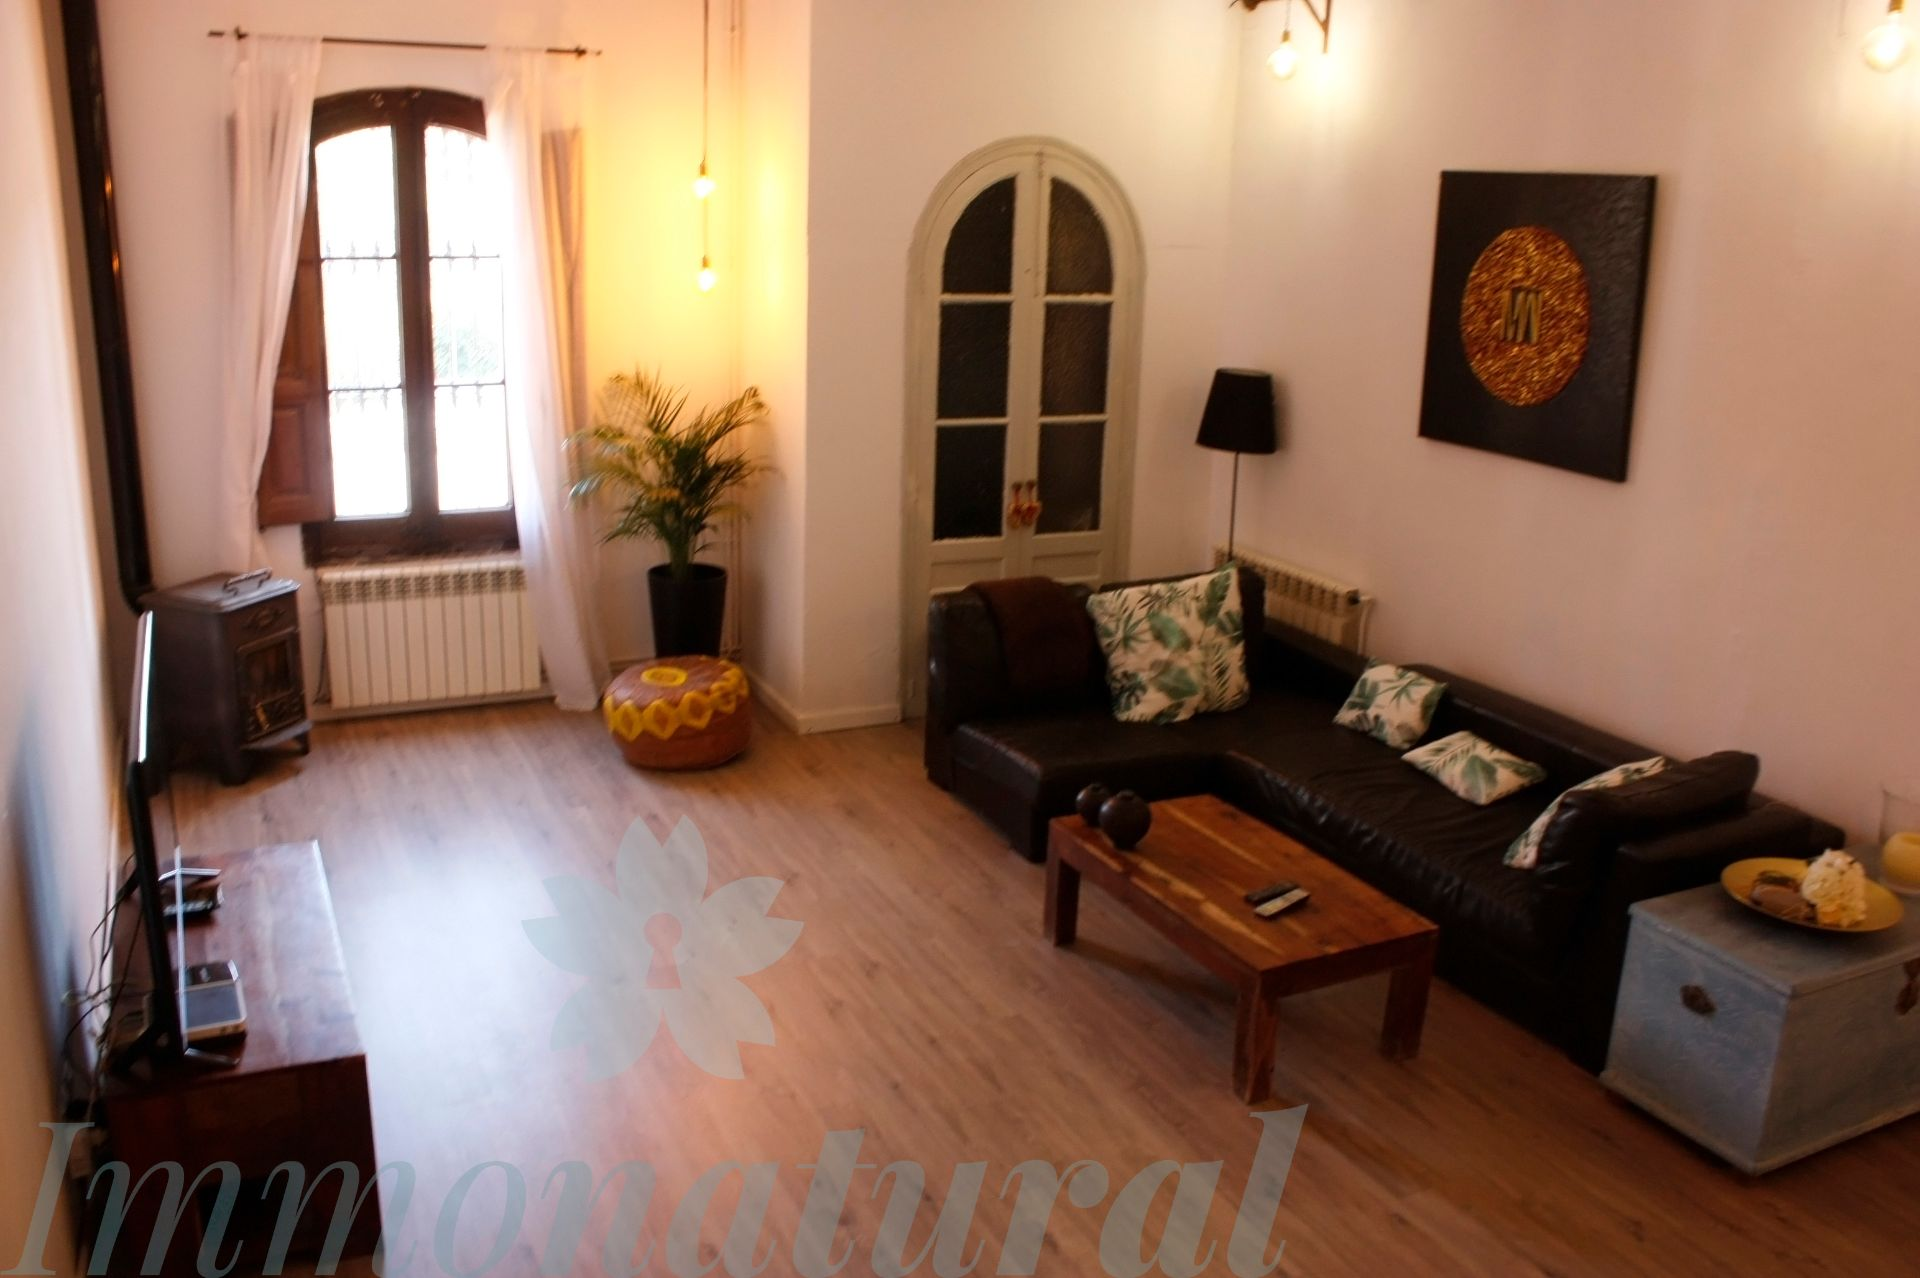 Casa adosada en Torrelles de Llobregat, CENTRO URBANO, venta